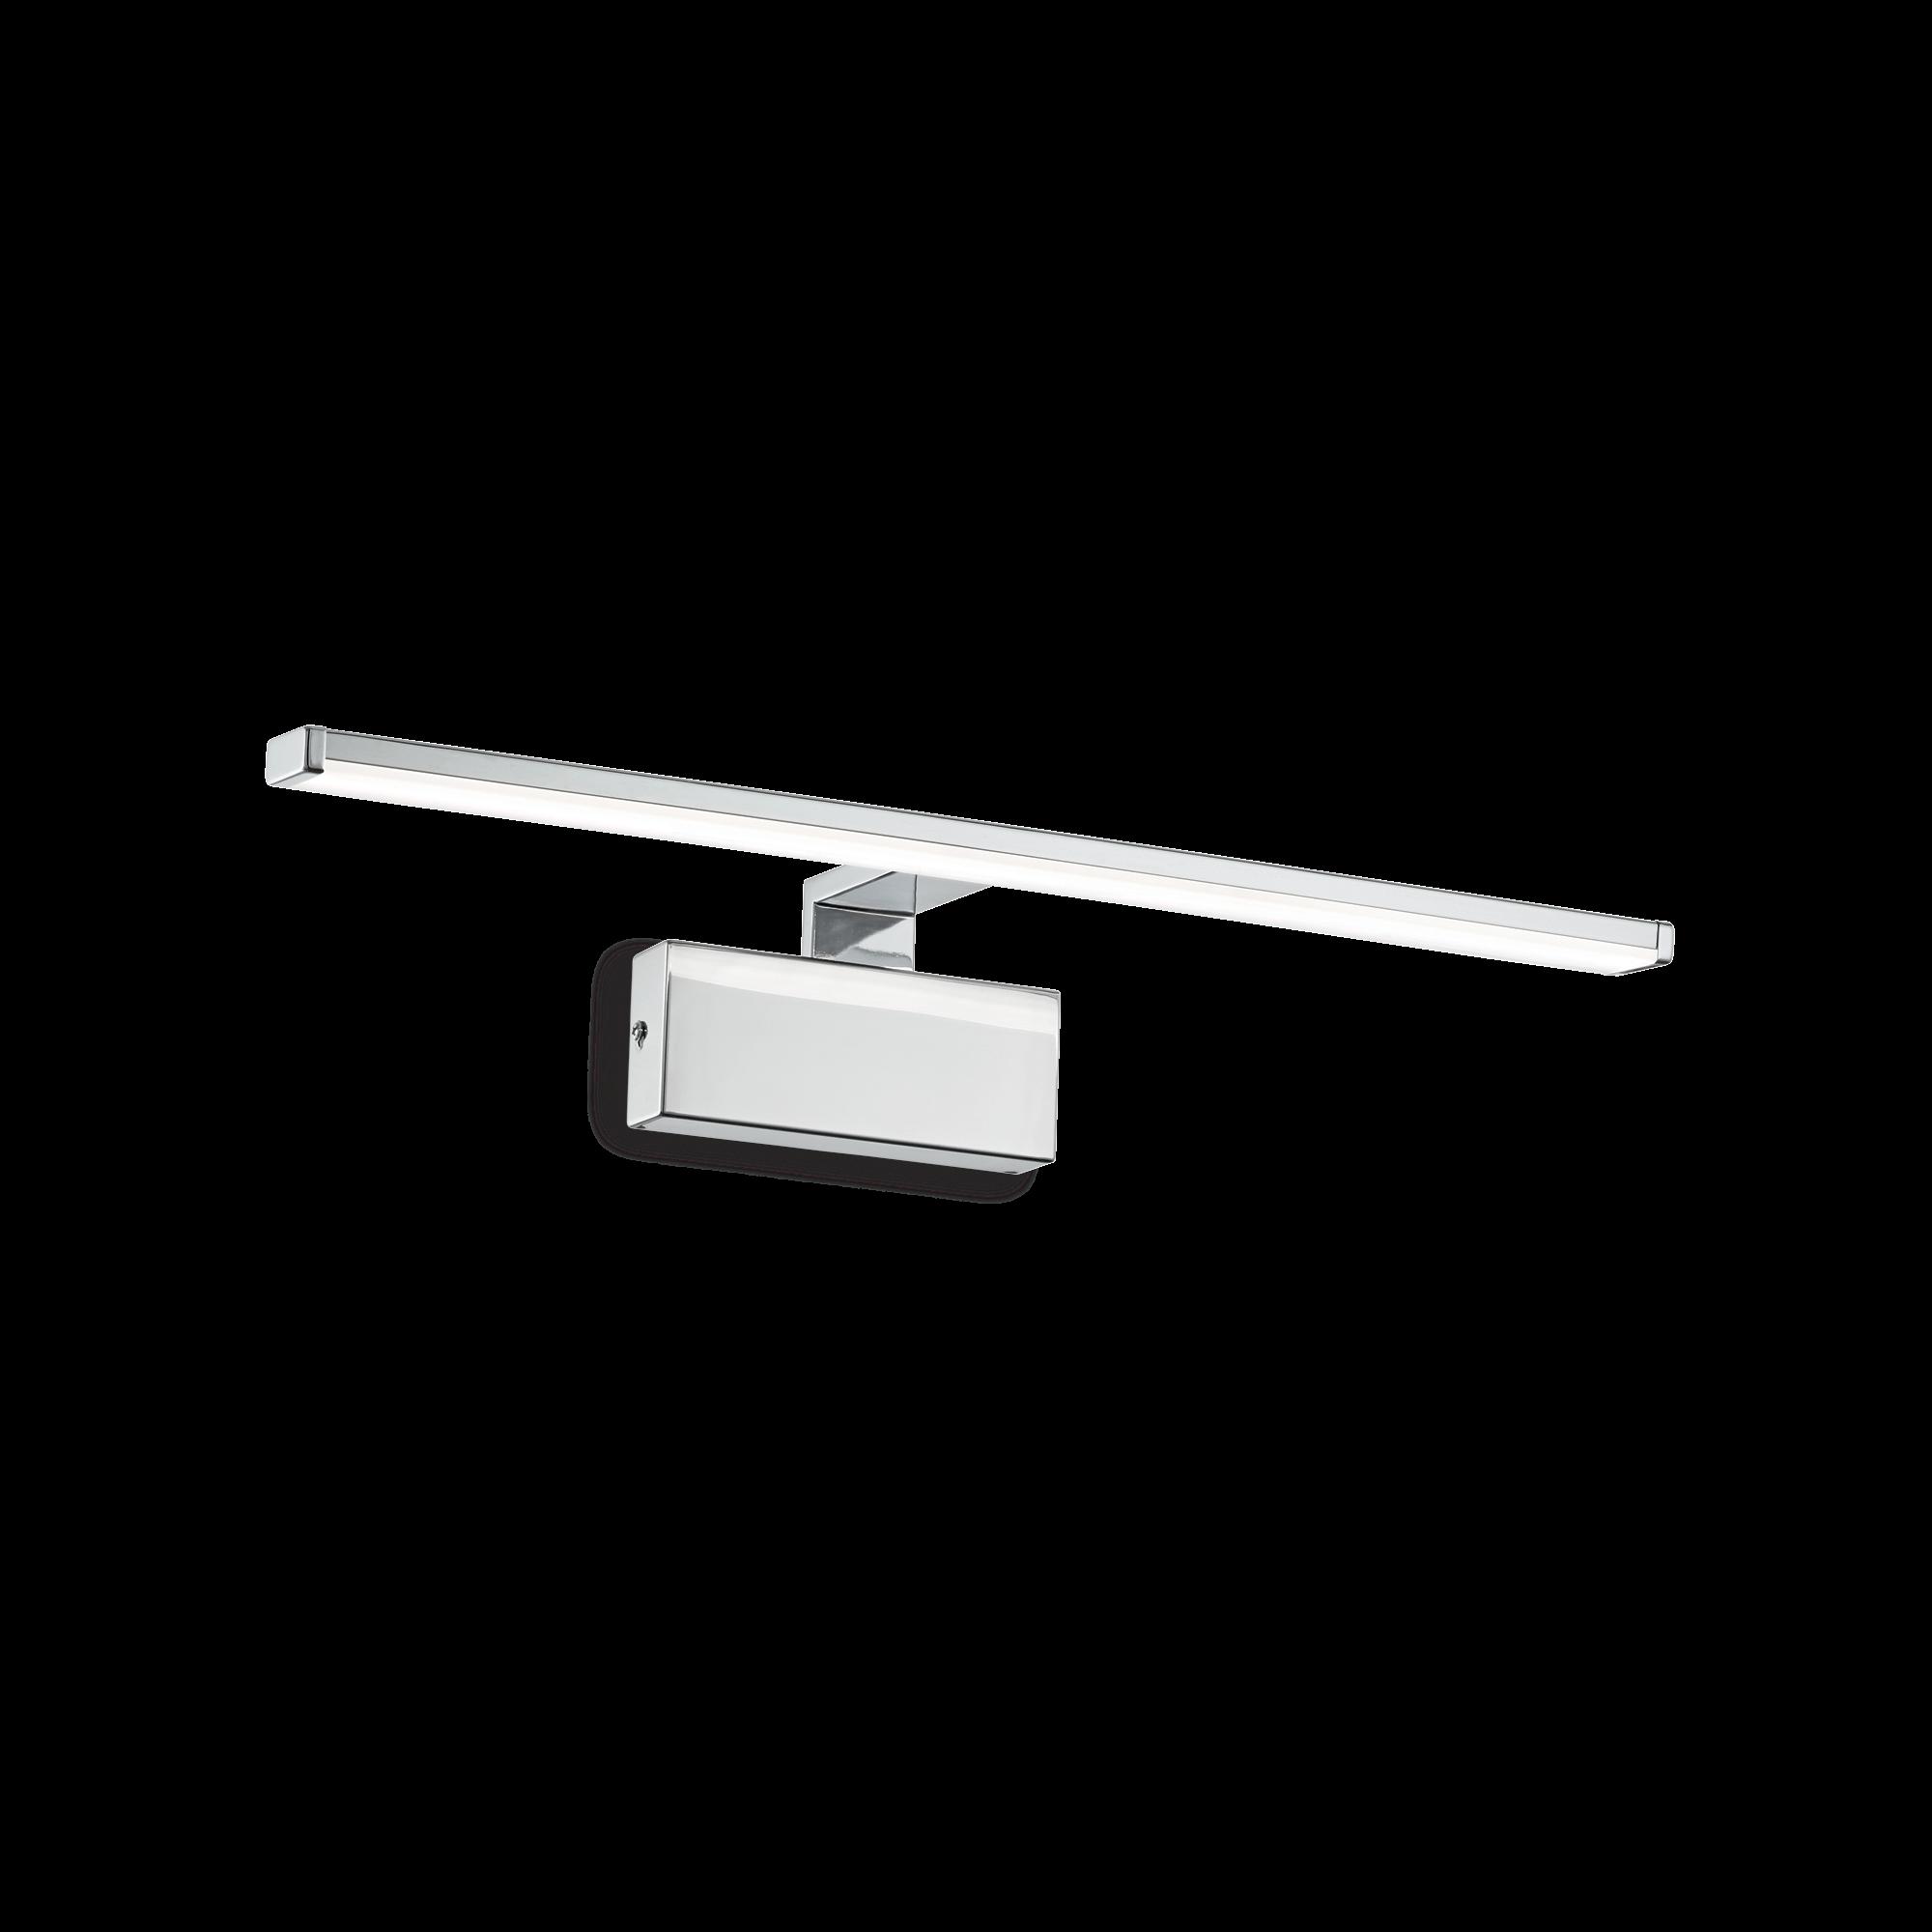 IdealLux 224930 ALMA AP nástěnné LED svítidlo k zrcadlu 12W 820lm 3000K IP20 chrom